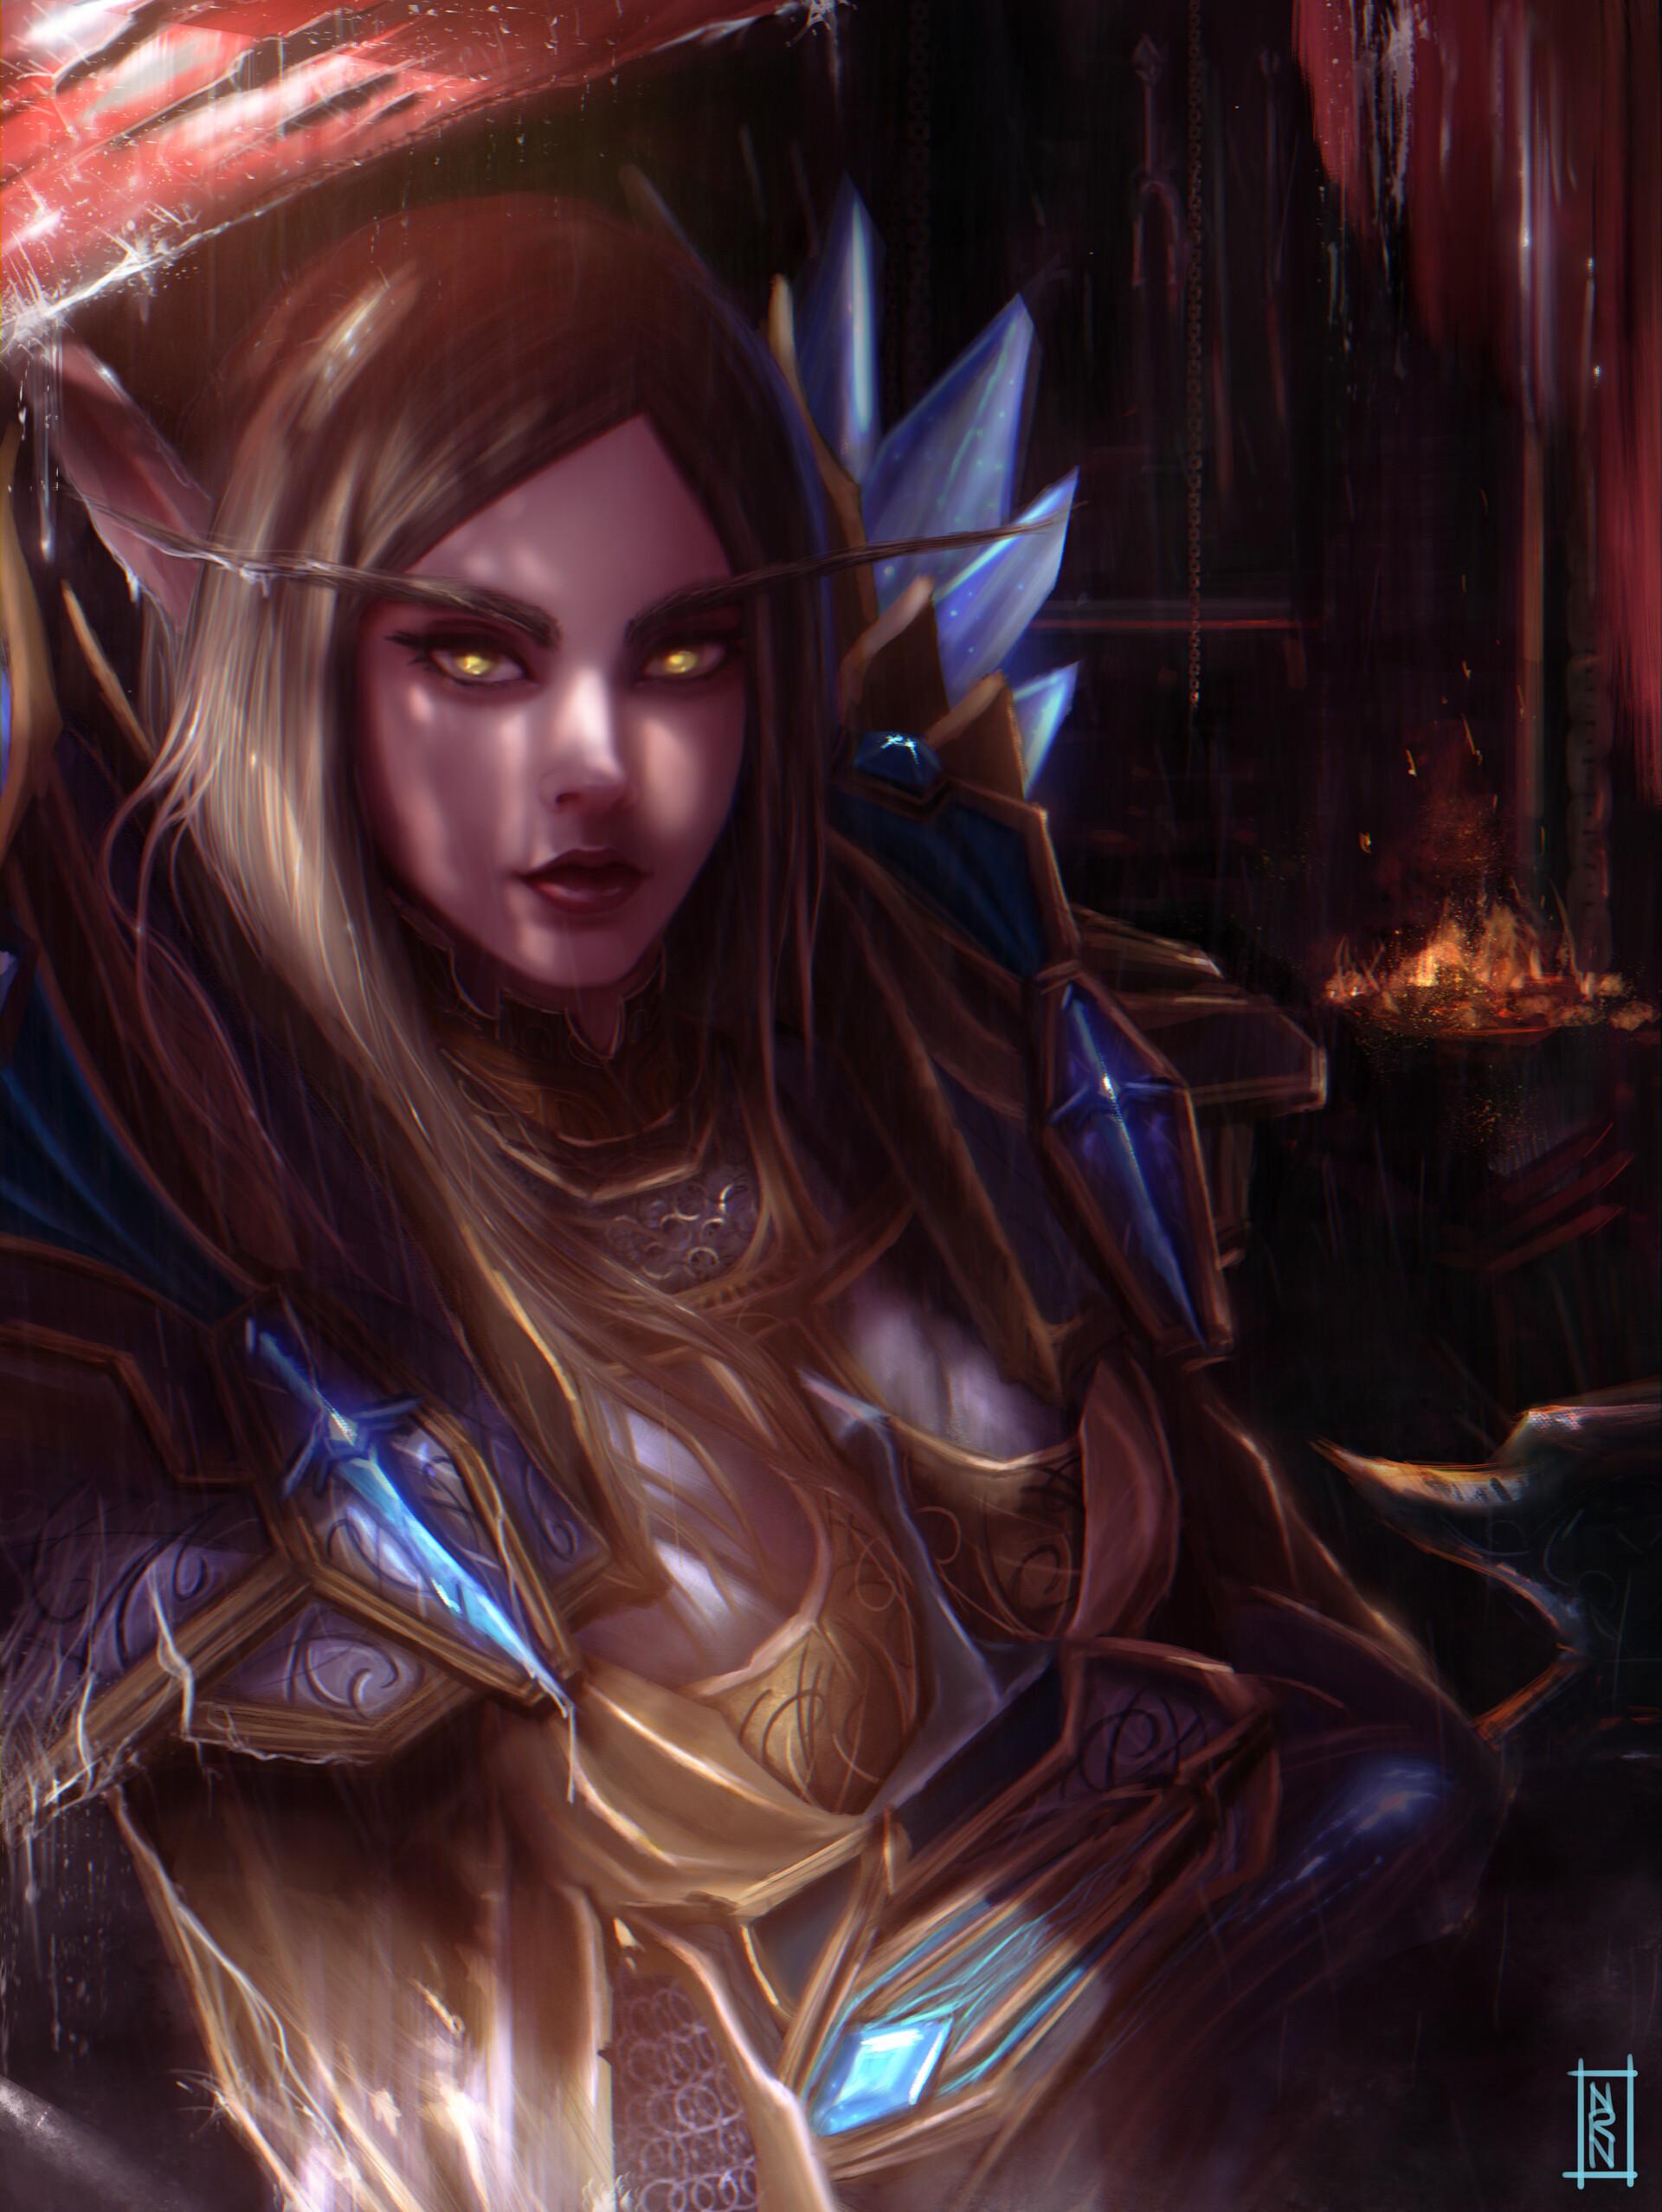 ArtStation - Sæssy - Warcraft , Natalia Romero Núñez